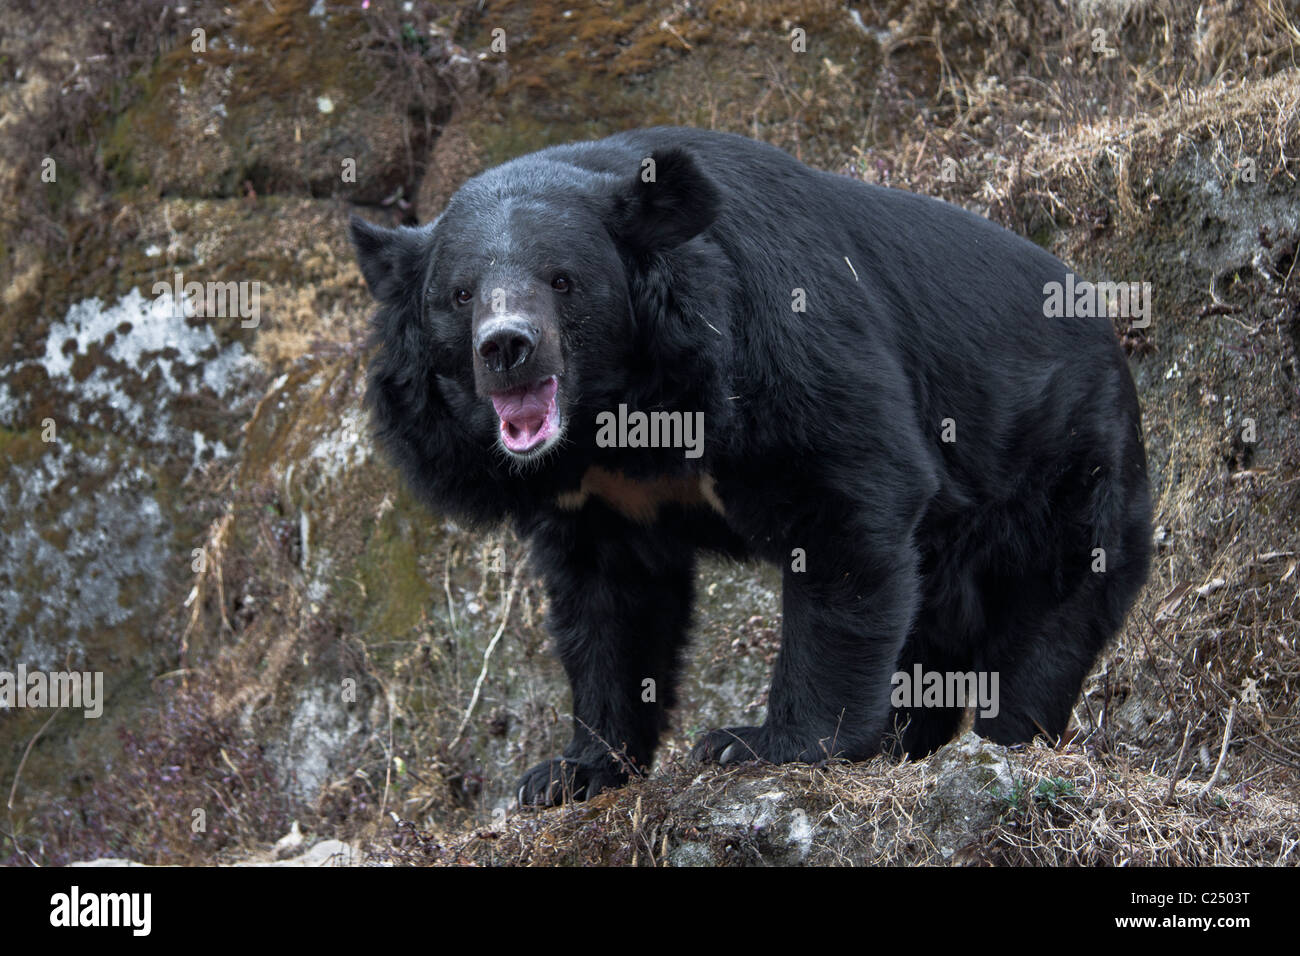 The Asian black bear (Ursus thibetanus), known as 'Kala Bhalu' in Hindi, at the Padmaja Naidu Himalayan - Stock Image